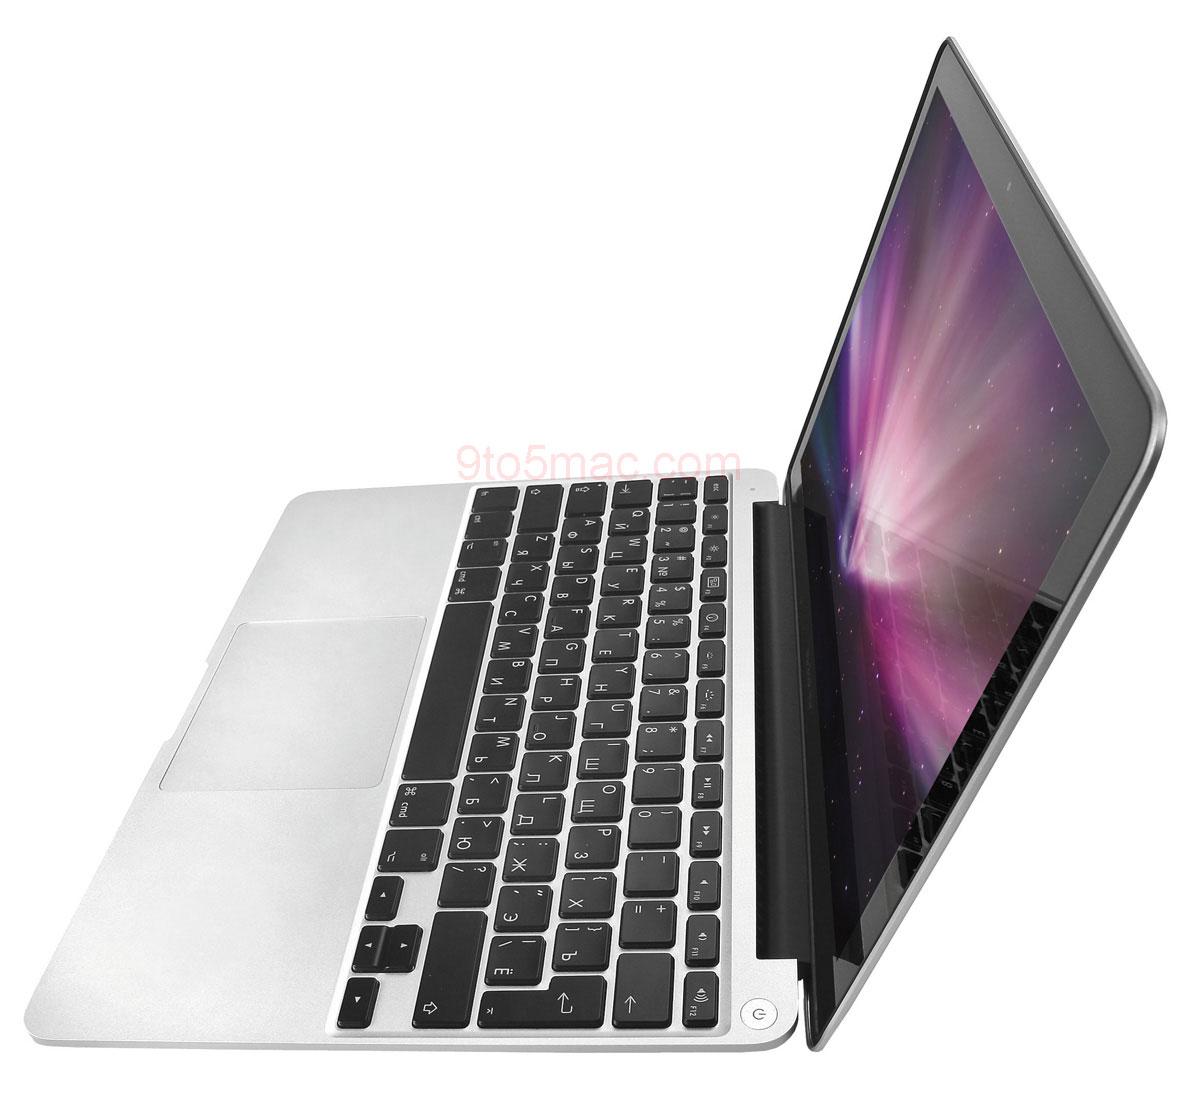 Apple MacBook mini: con, concept or 2009's must-have?